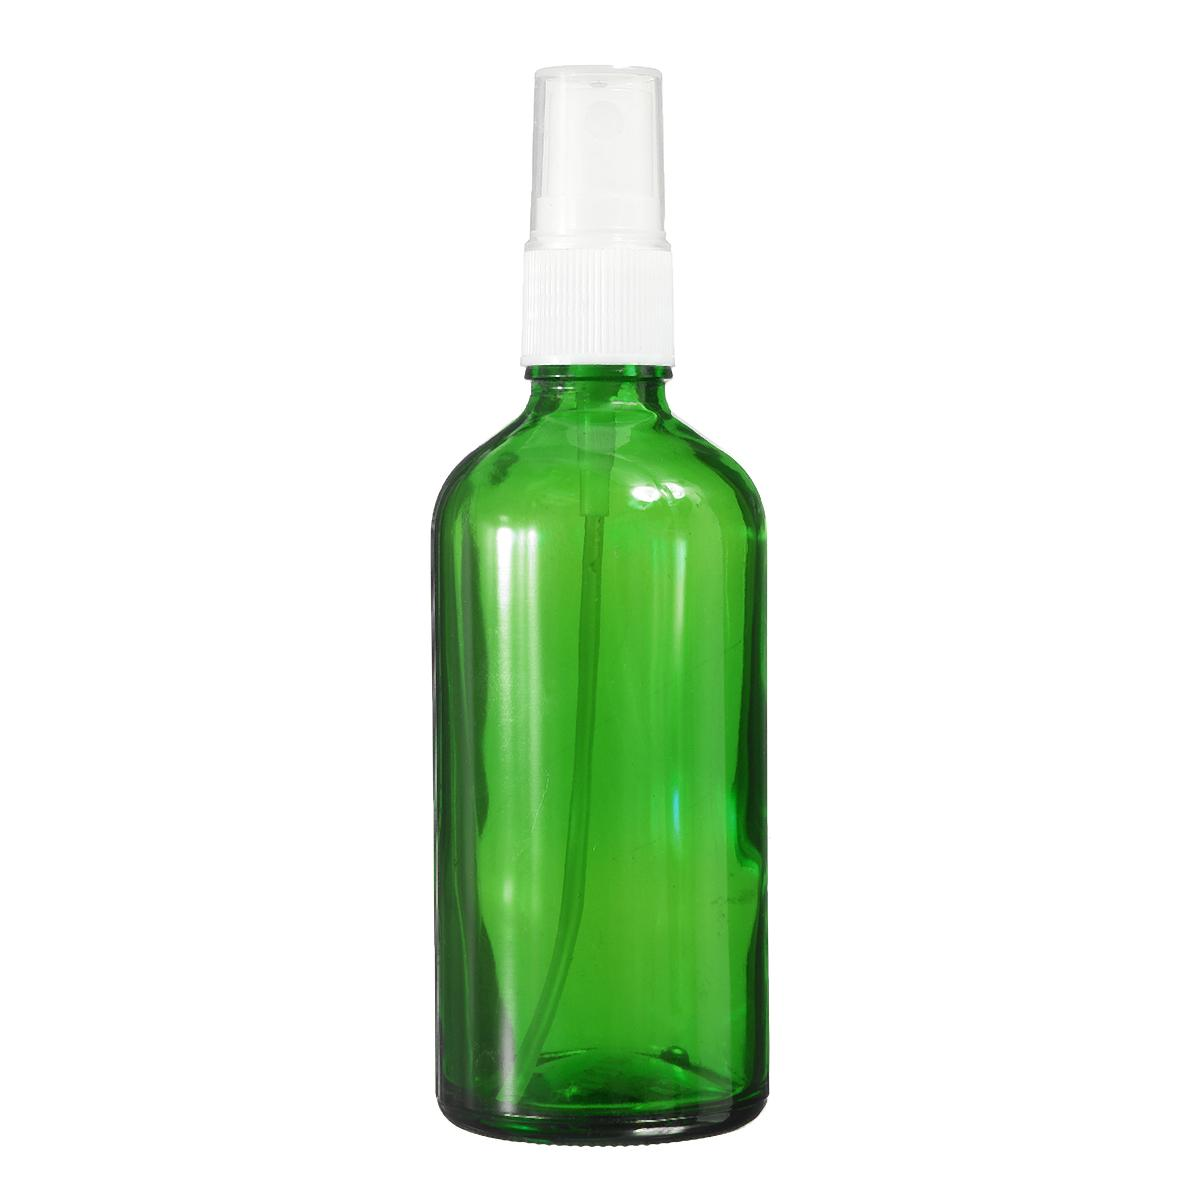 30pcs 100ml Green Glass Spray Bottle White Fine Mist Sprayer Essential Oil Liquid Perfume Water Vial Atomizer Empty Cosmetic Container